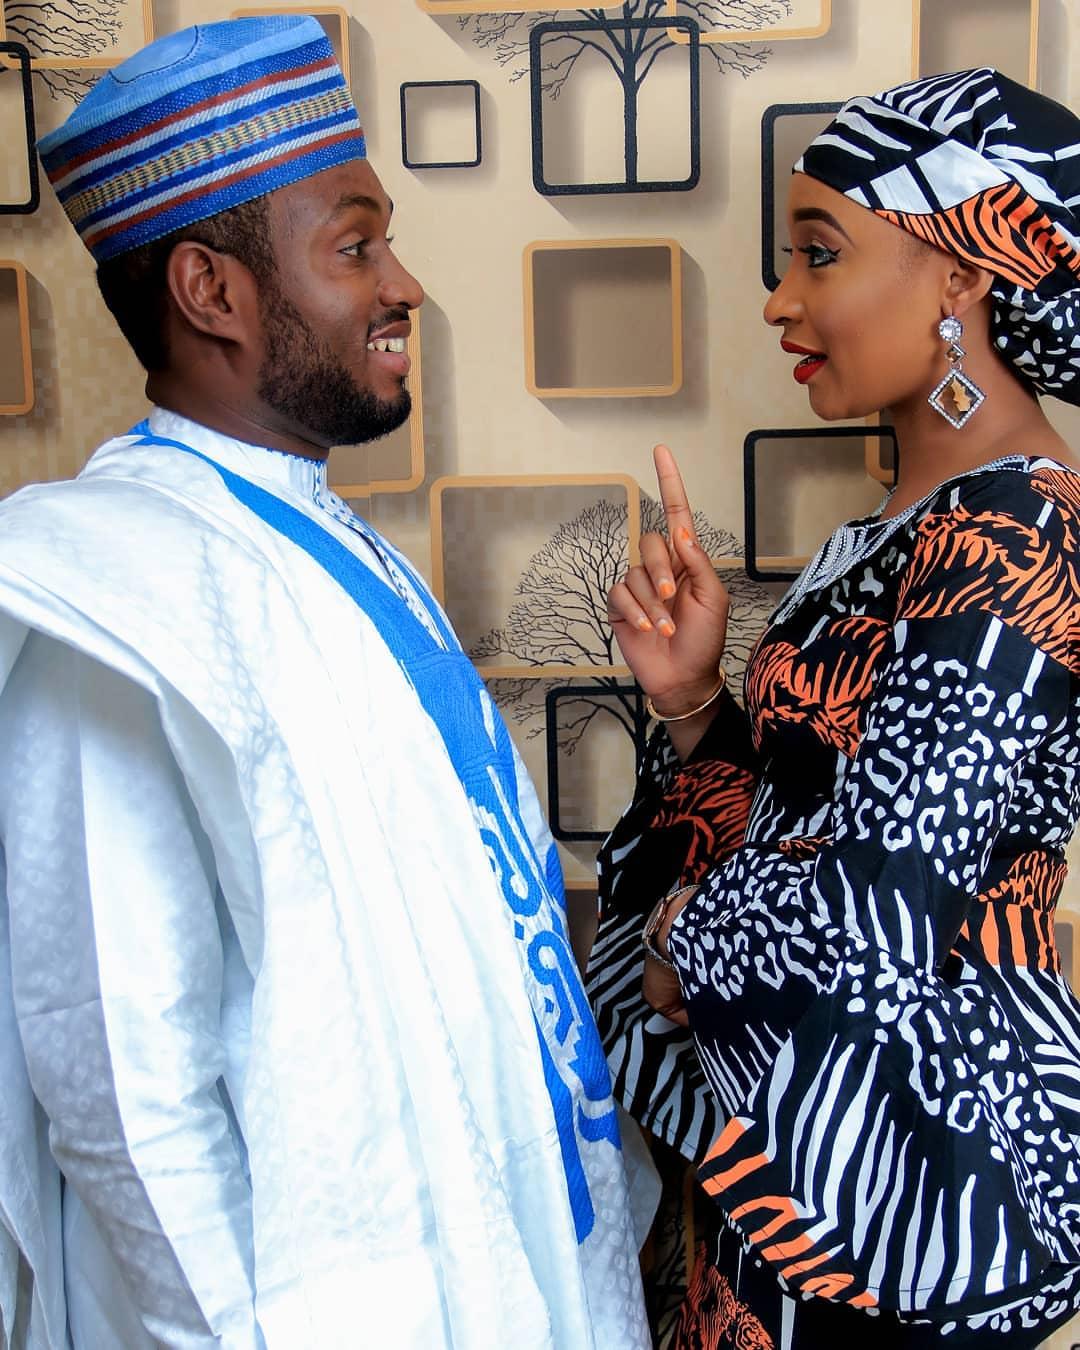 Maganar Gaskiya : Akan Hotunan Pre-wedding na Sadiq sani Sadiq Da Rahama Sadau - Daga Rahama sadau